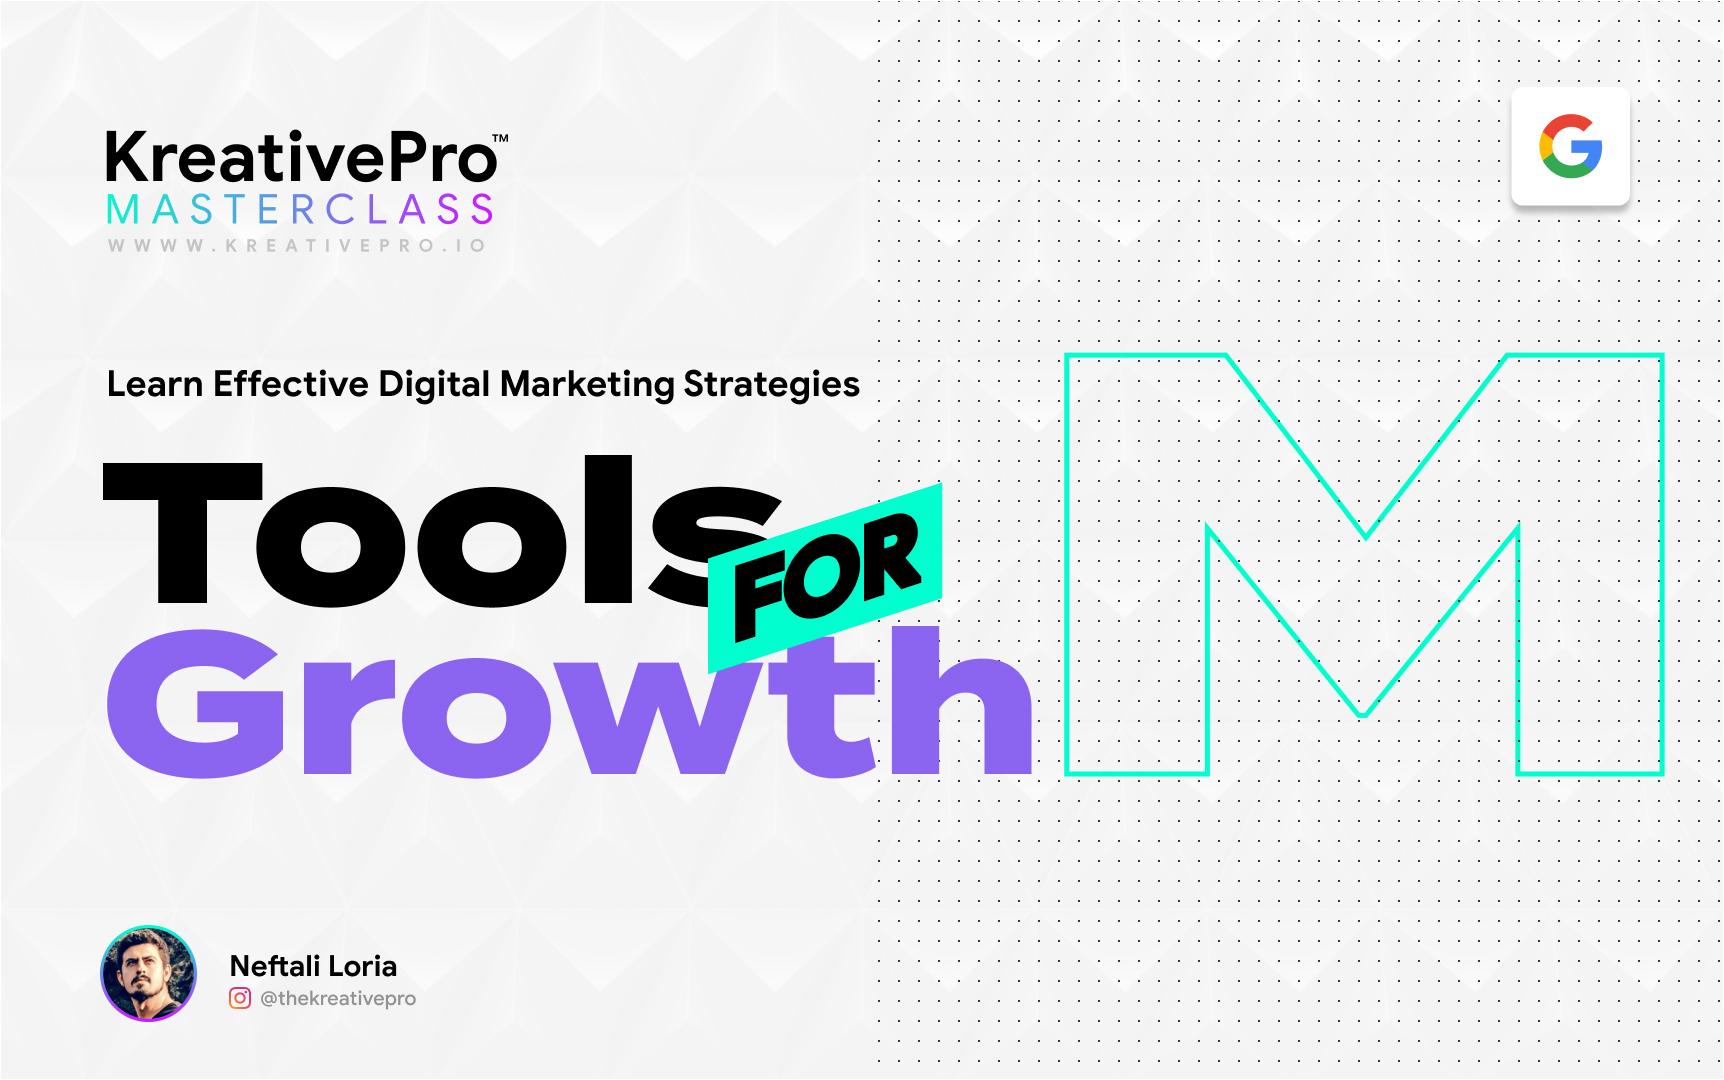 Marketing 3.4 - Organic Social Media Marketing and Tools for Growth